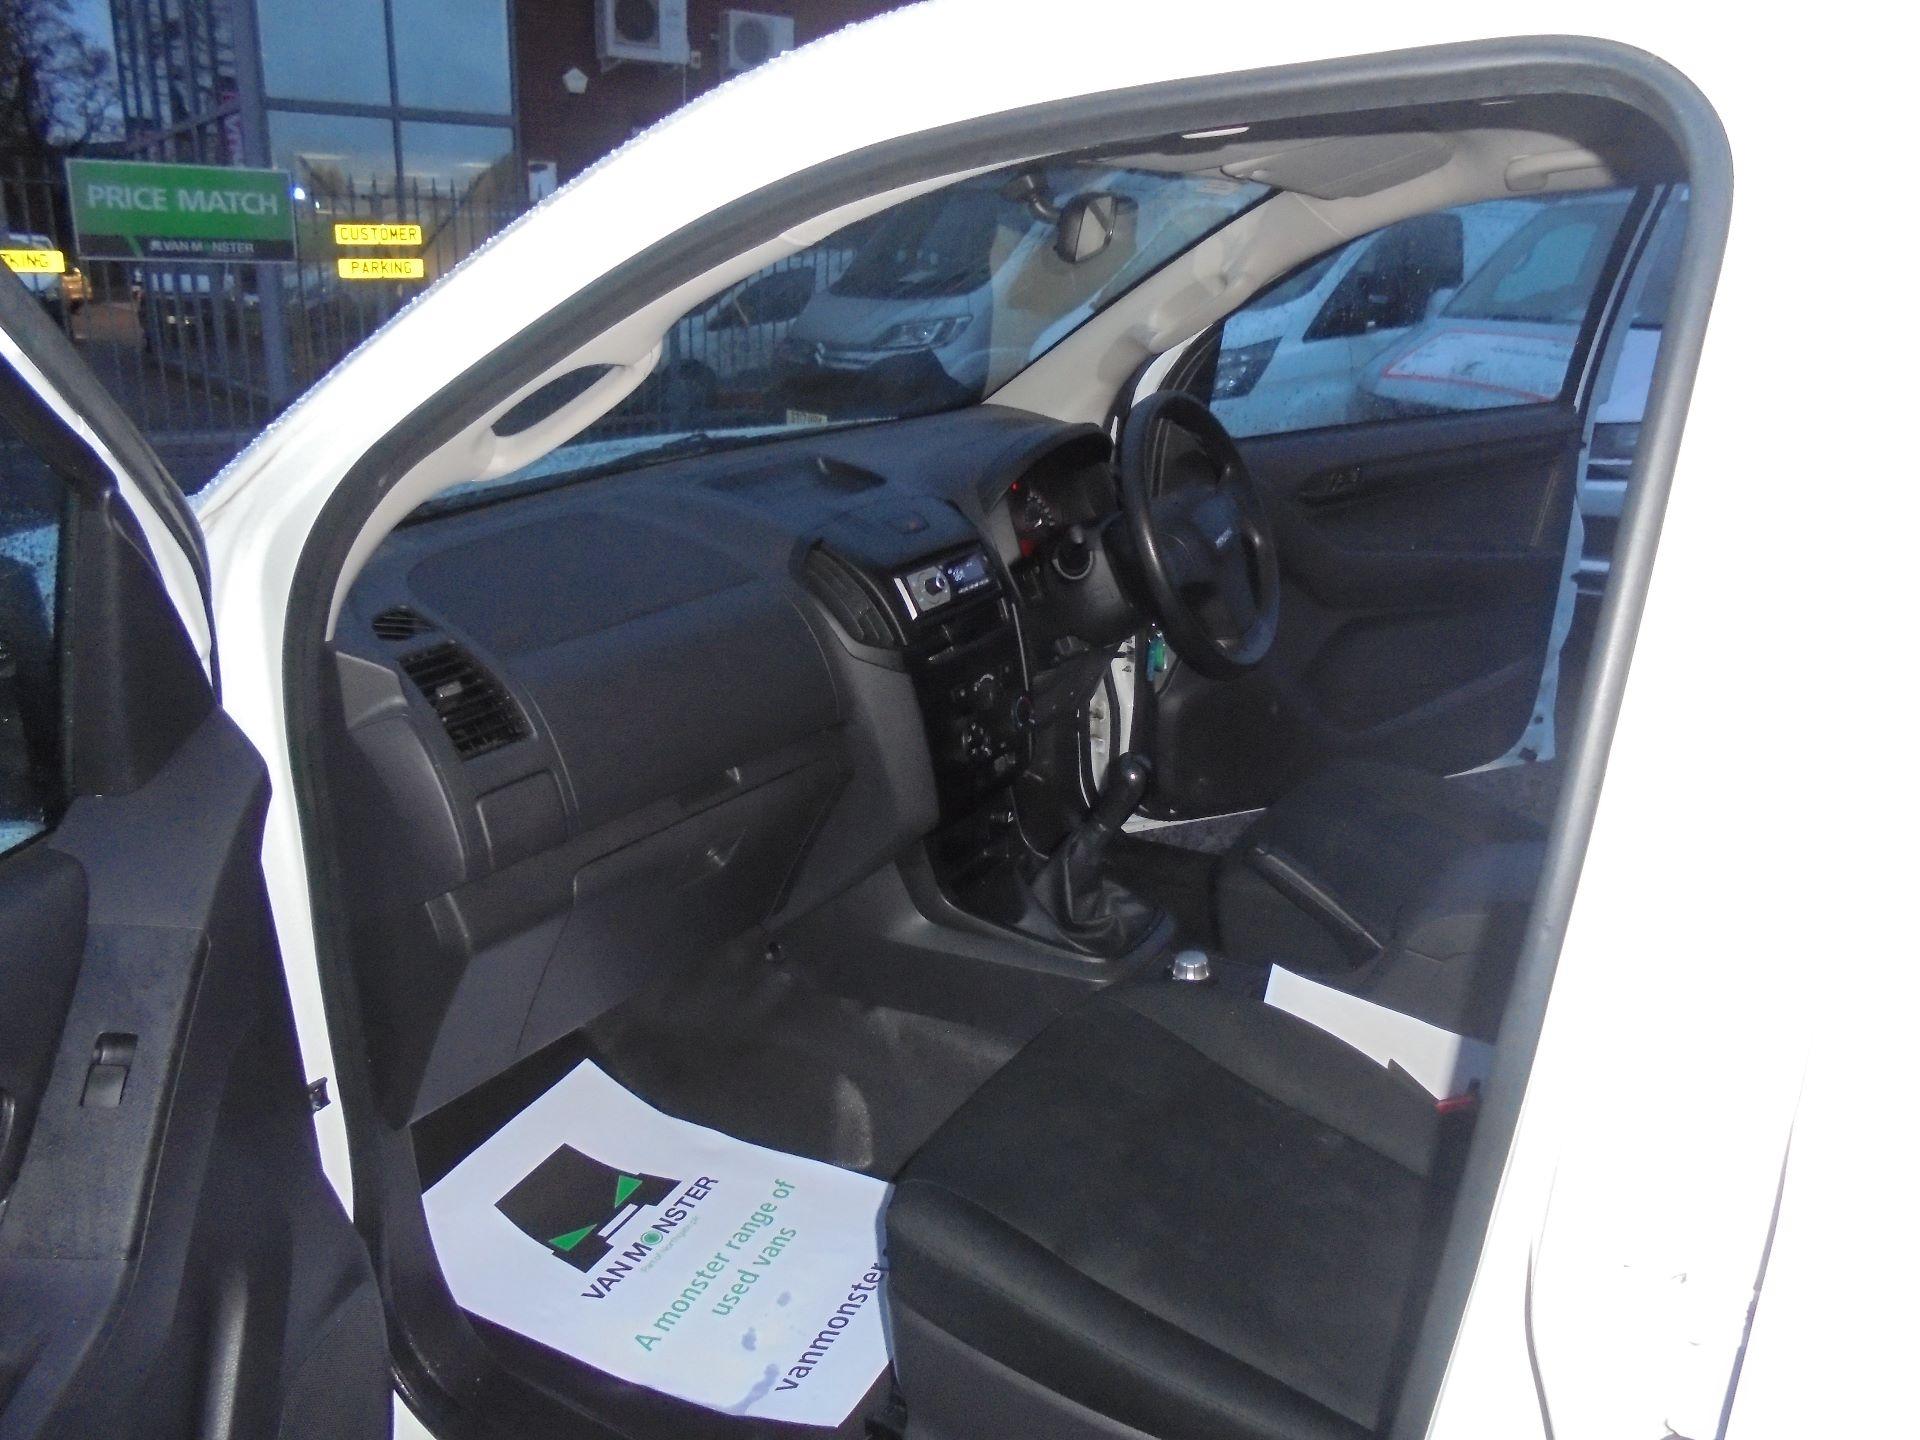 2017 Isuzu D-Max 1.9 Double Cab 4X4 (YD67YVZ) Image 15